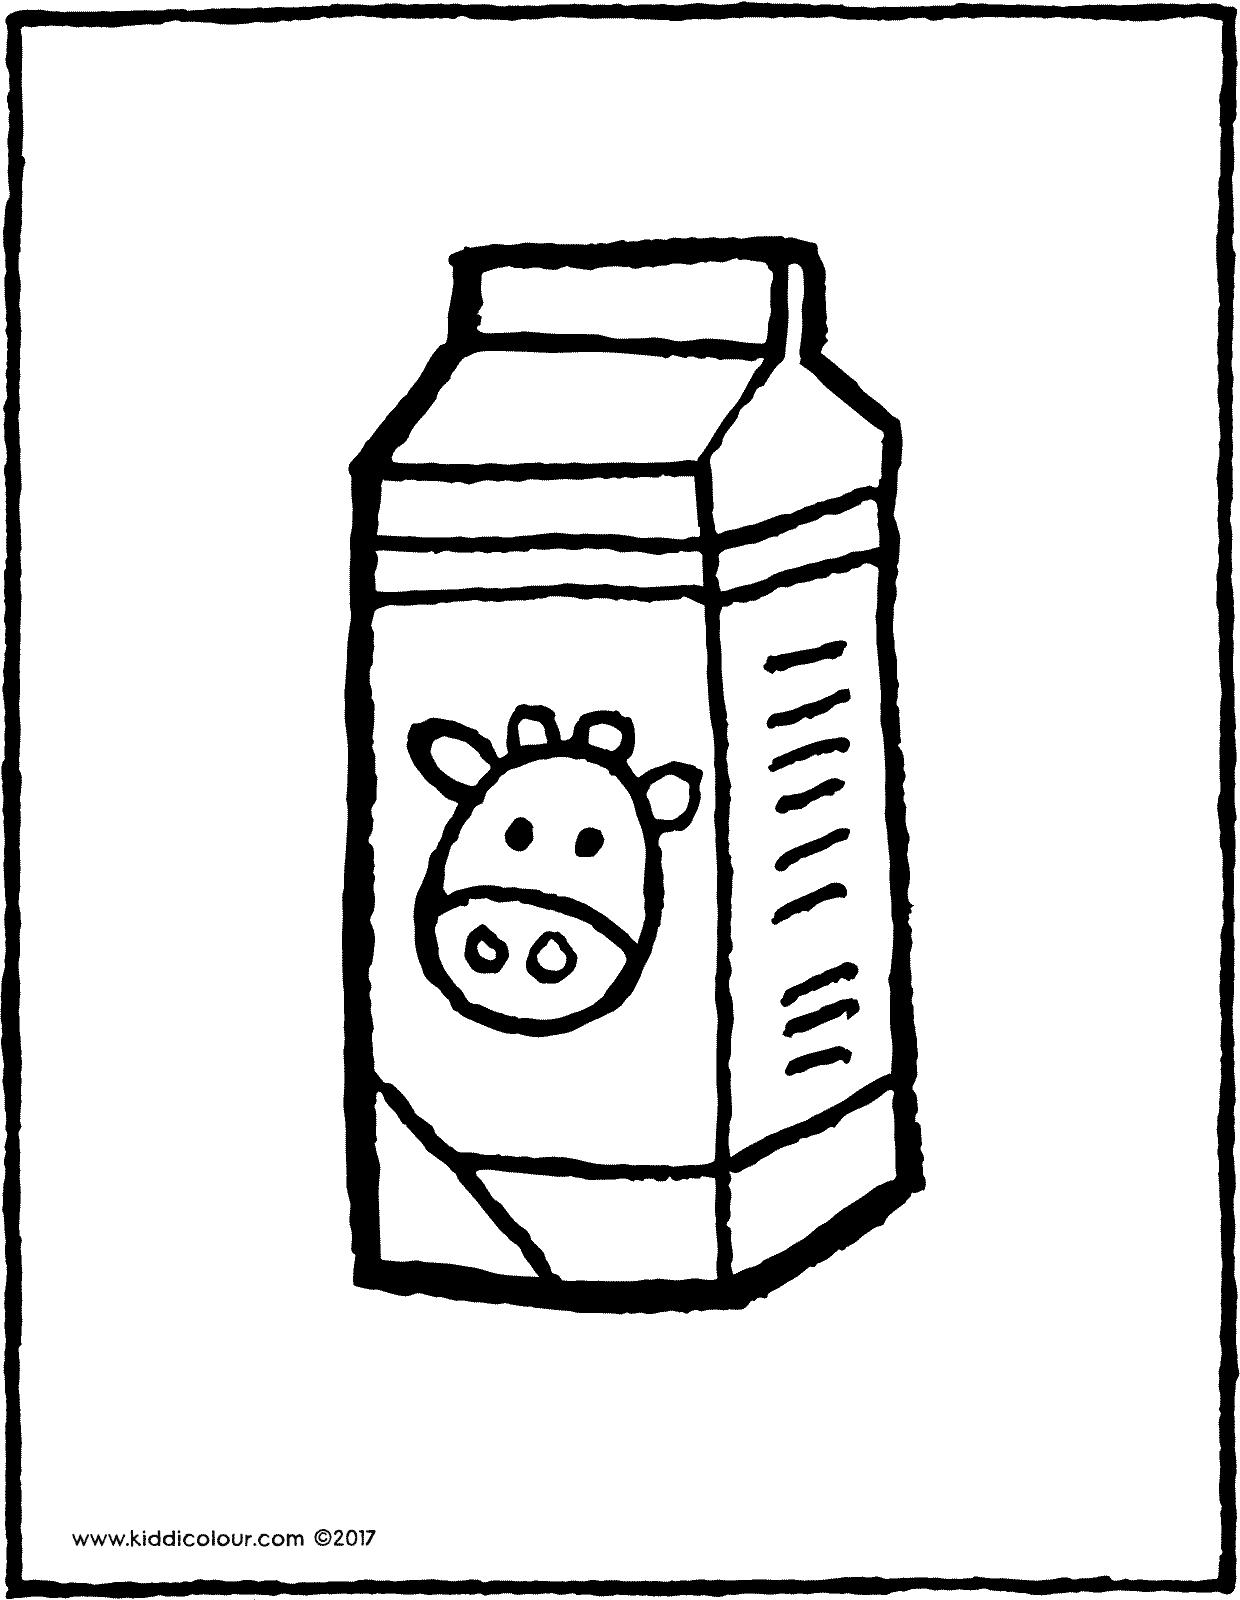 milk coloring pages a carton of milk kiddicolour milk pages coloring